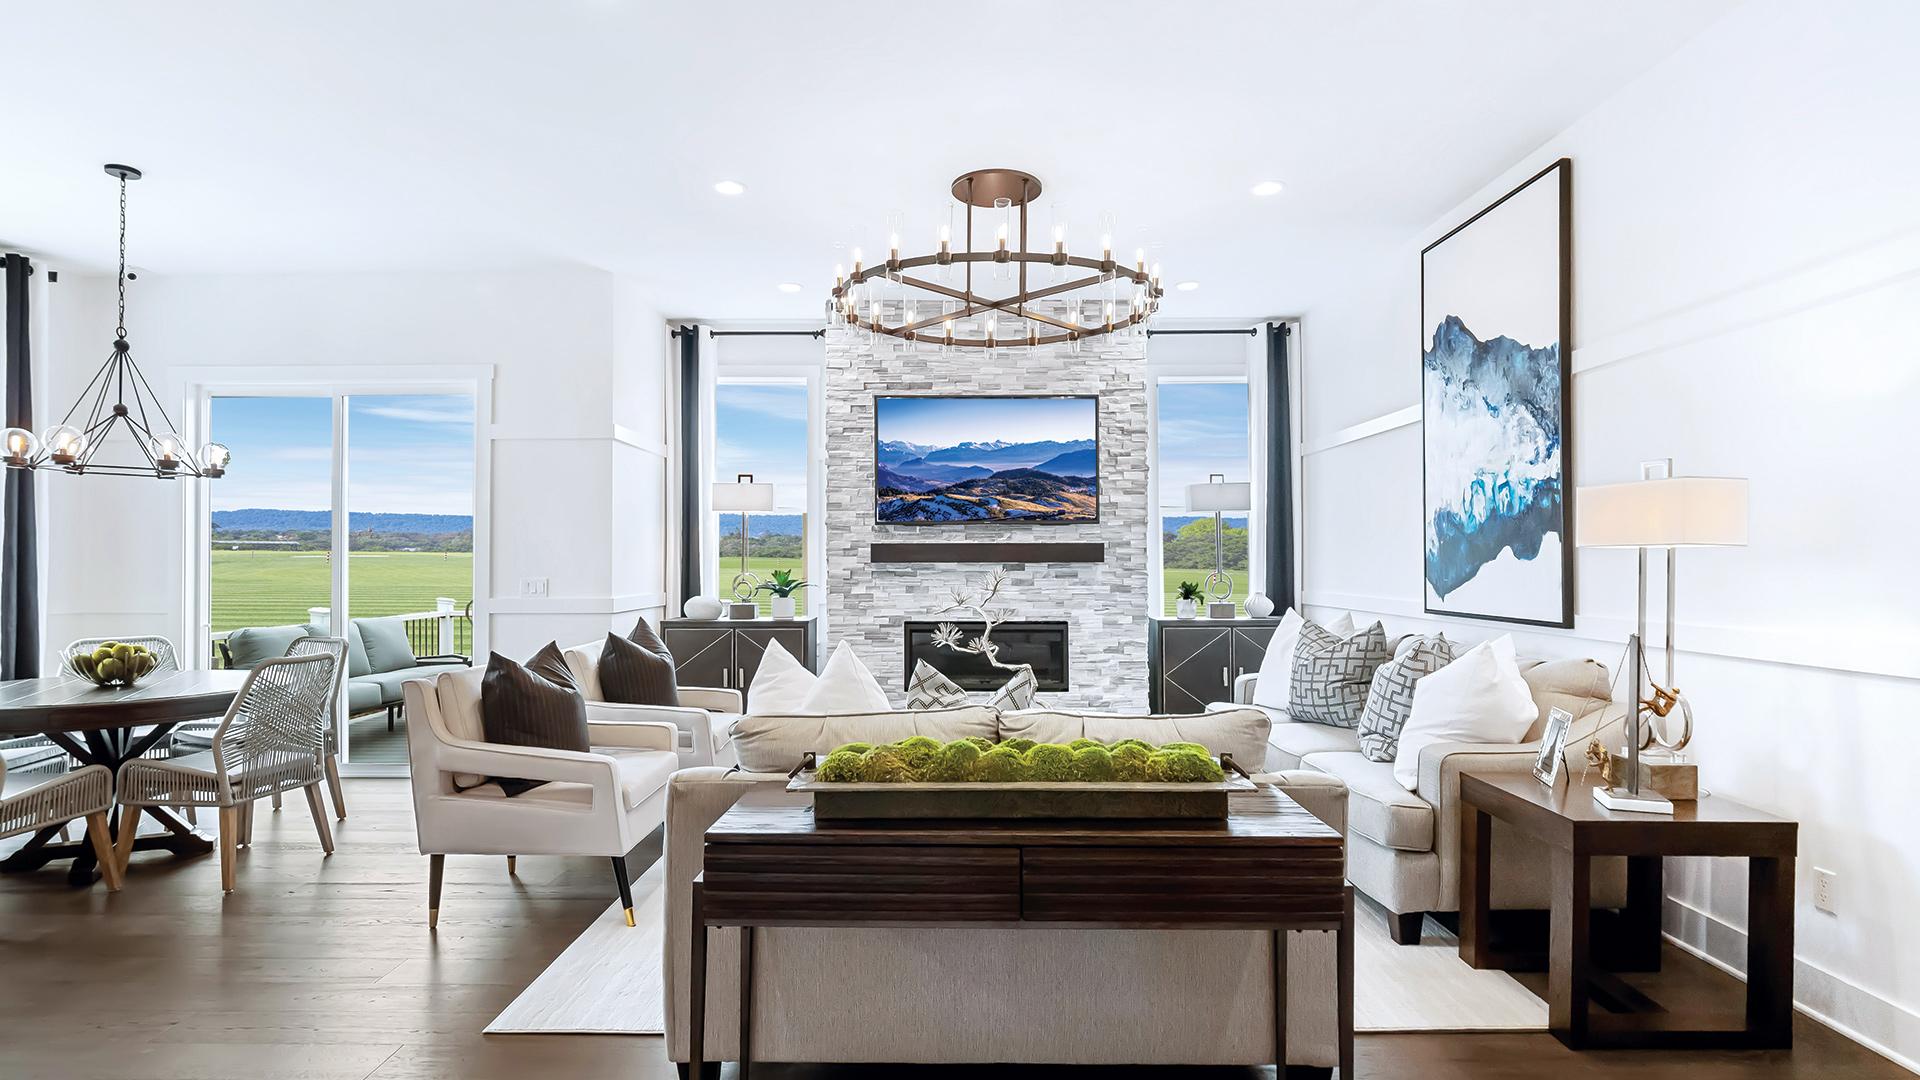 Spacious, ranch-style designs